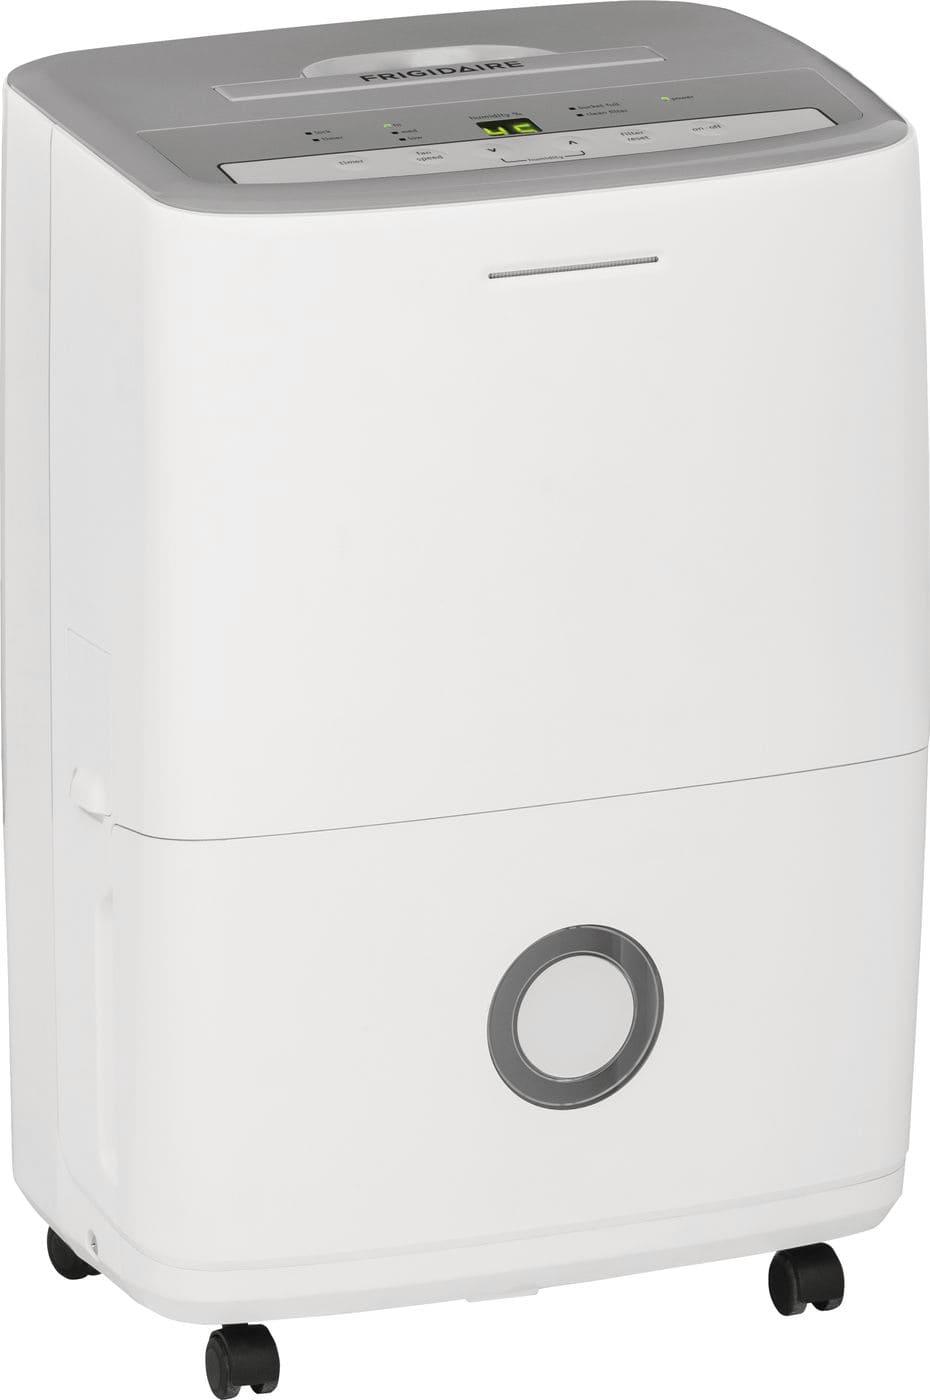 Model: FFAD3033R1 | Frigidaire Small Room 30 Pint Capacity Dehumidifier